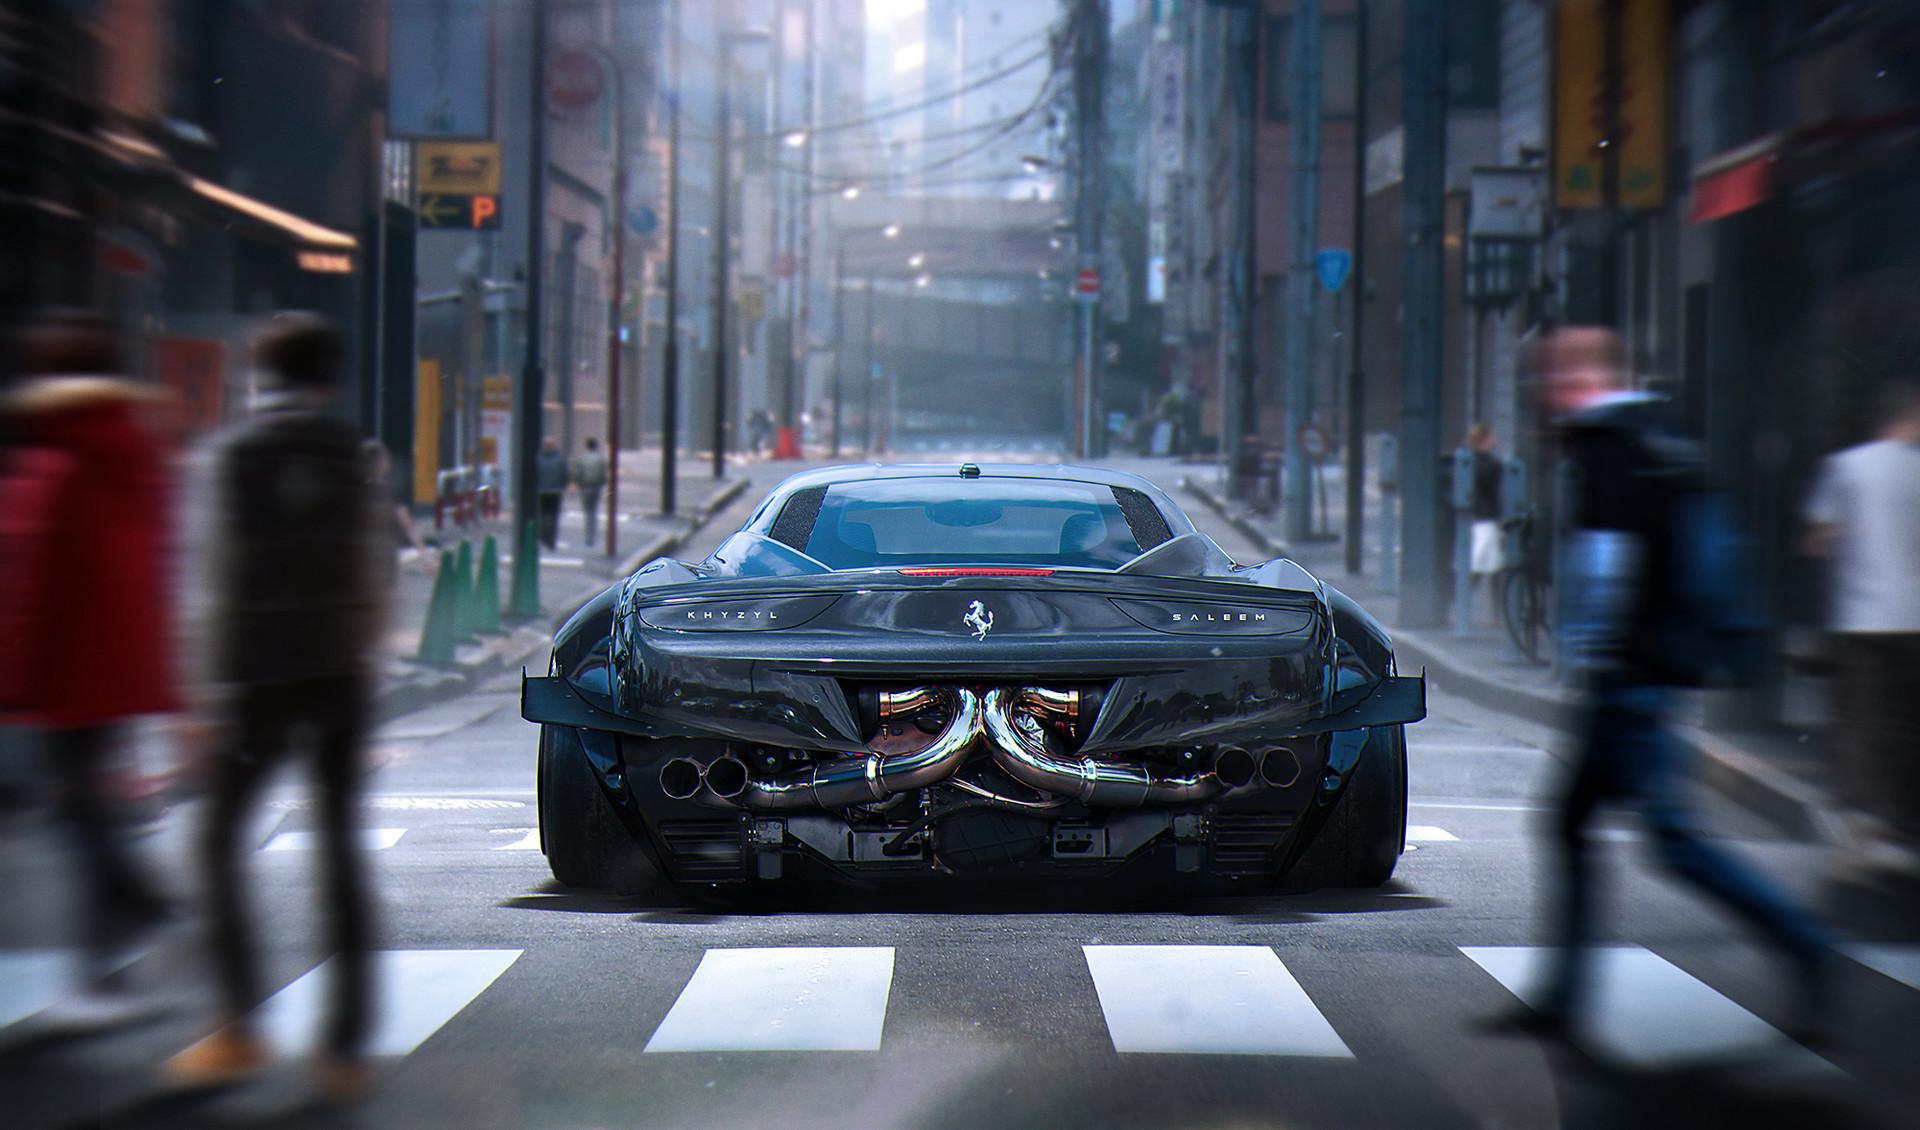 144869 download wallpaper Ferrari, Cars, City, Back View, Rear View, Crosswalk, Pedestrian Crossing, 458, Italia screensavers and pictures for free